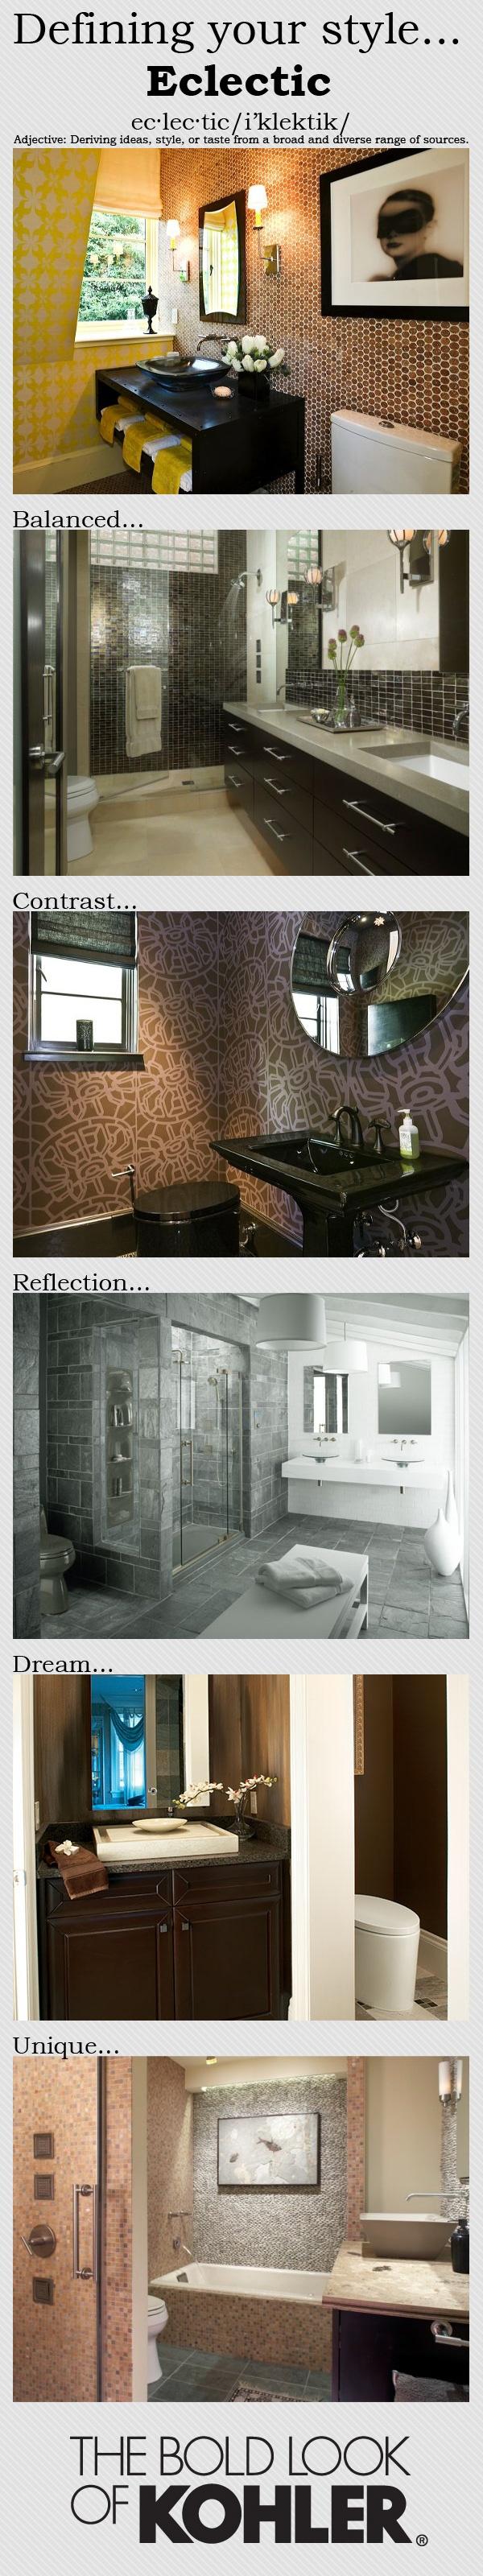 @Kohler Co. The Bold Look of Kohler! Defining Your Style Guide with the Bold look of #Bathroom #Kohler #Design #Remodel